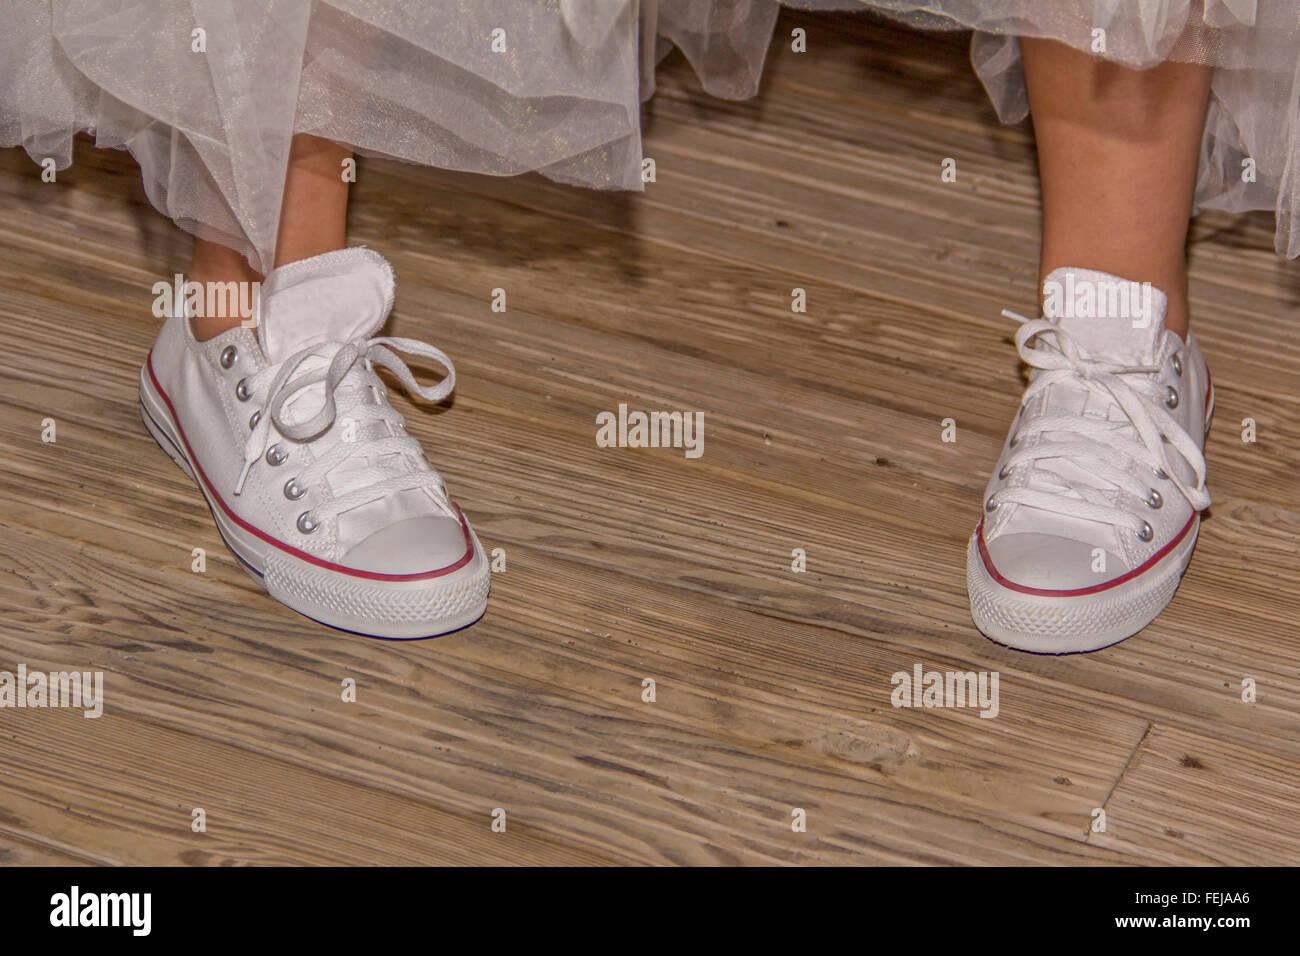 33dd0611a6b wedding shoes no heels comfortable dancing Stock Photo: 95060286 - Alamy